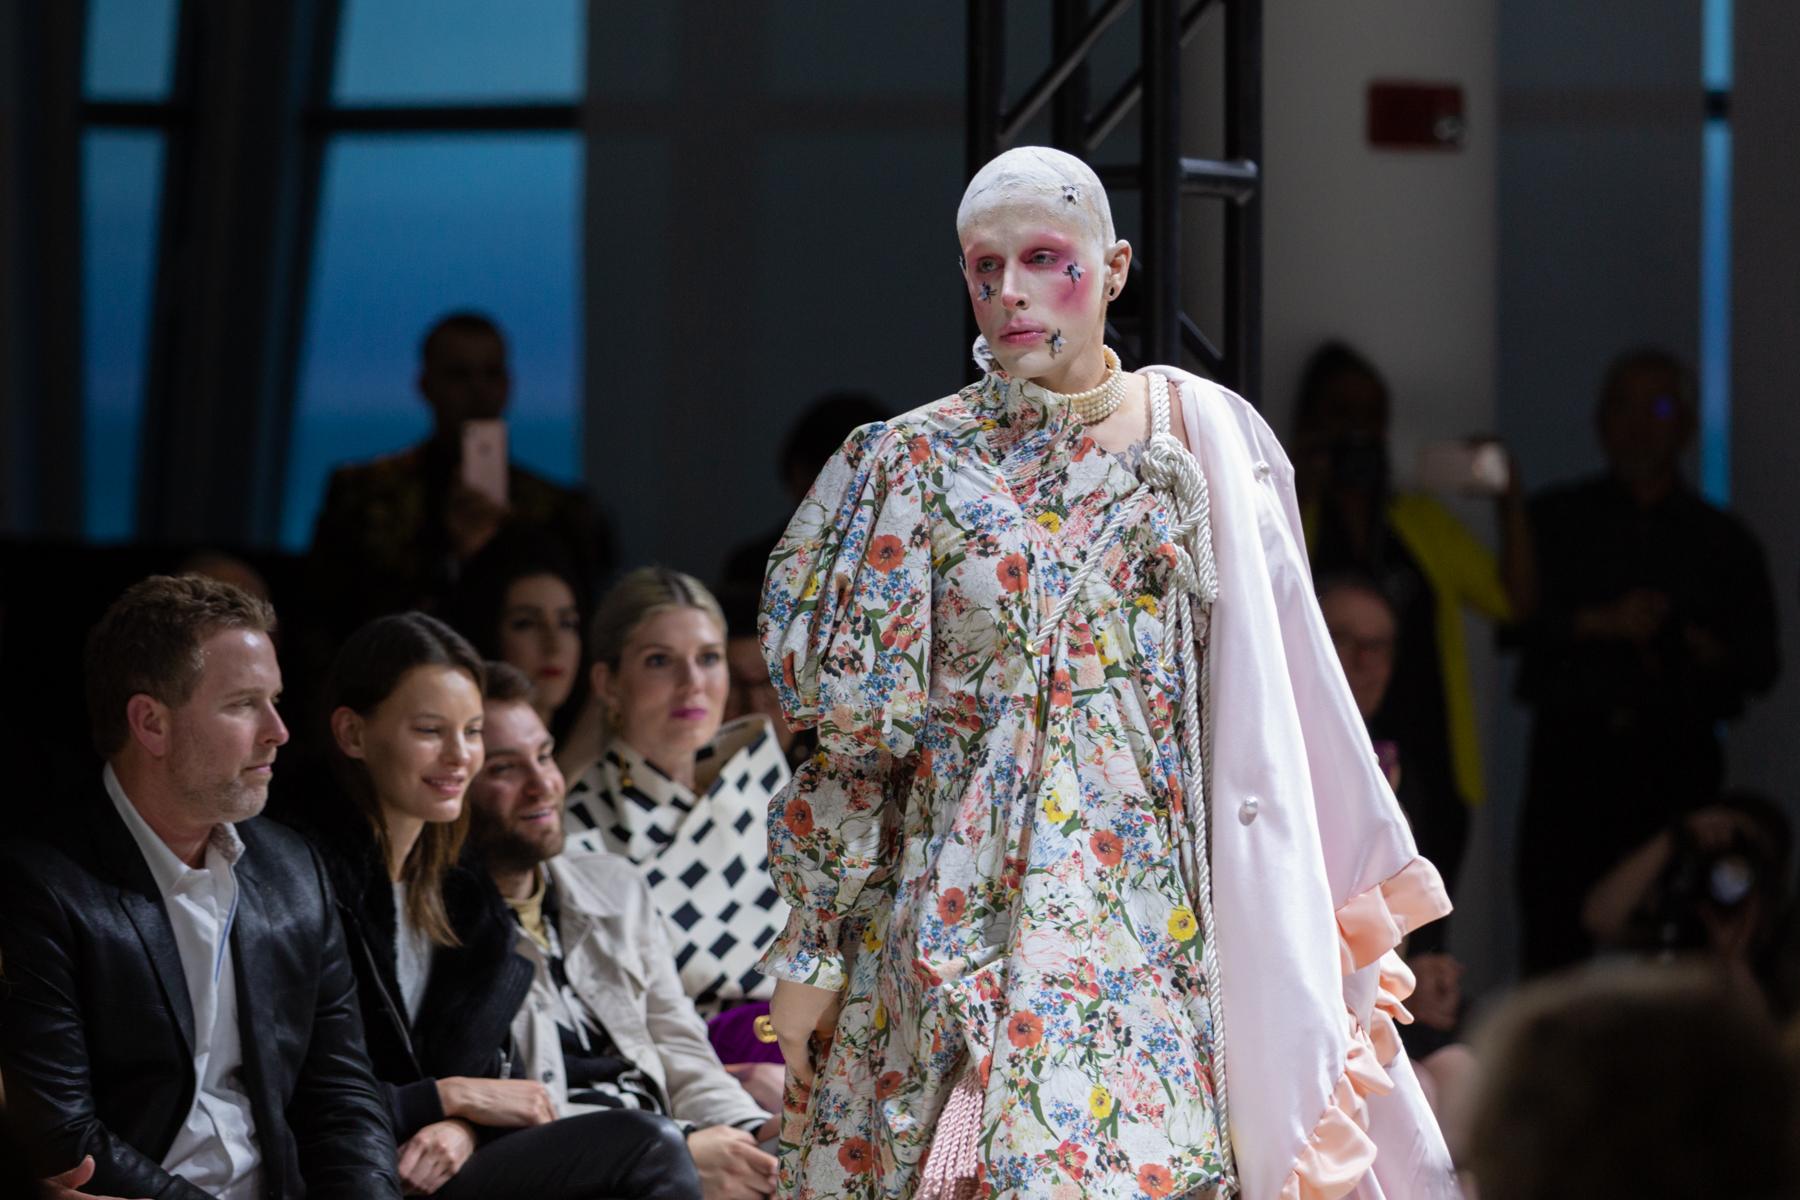 connor_fenwick_saic_fashion_event_02.jpg